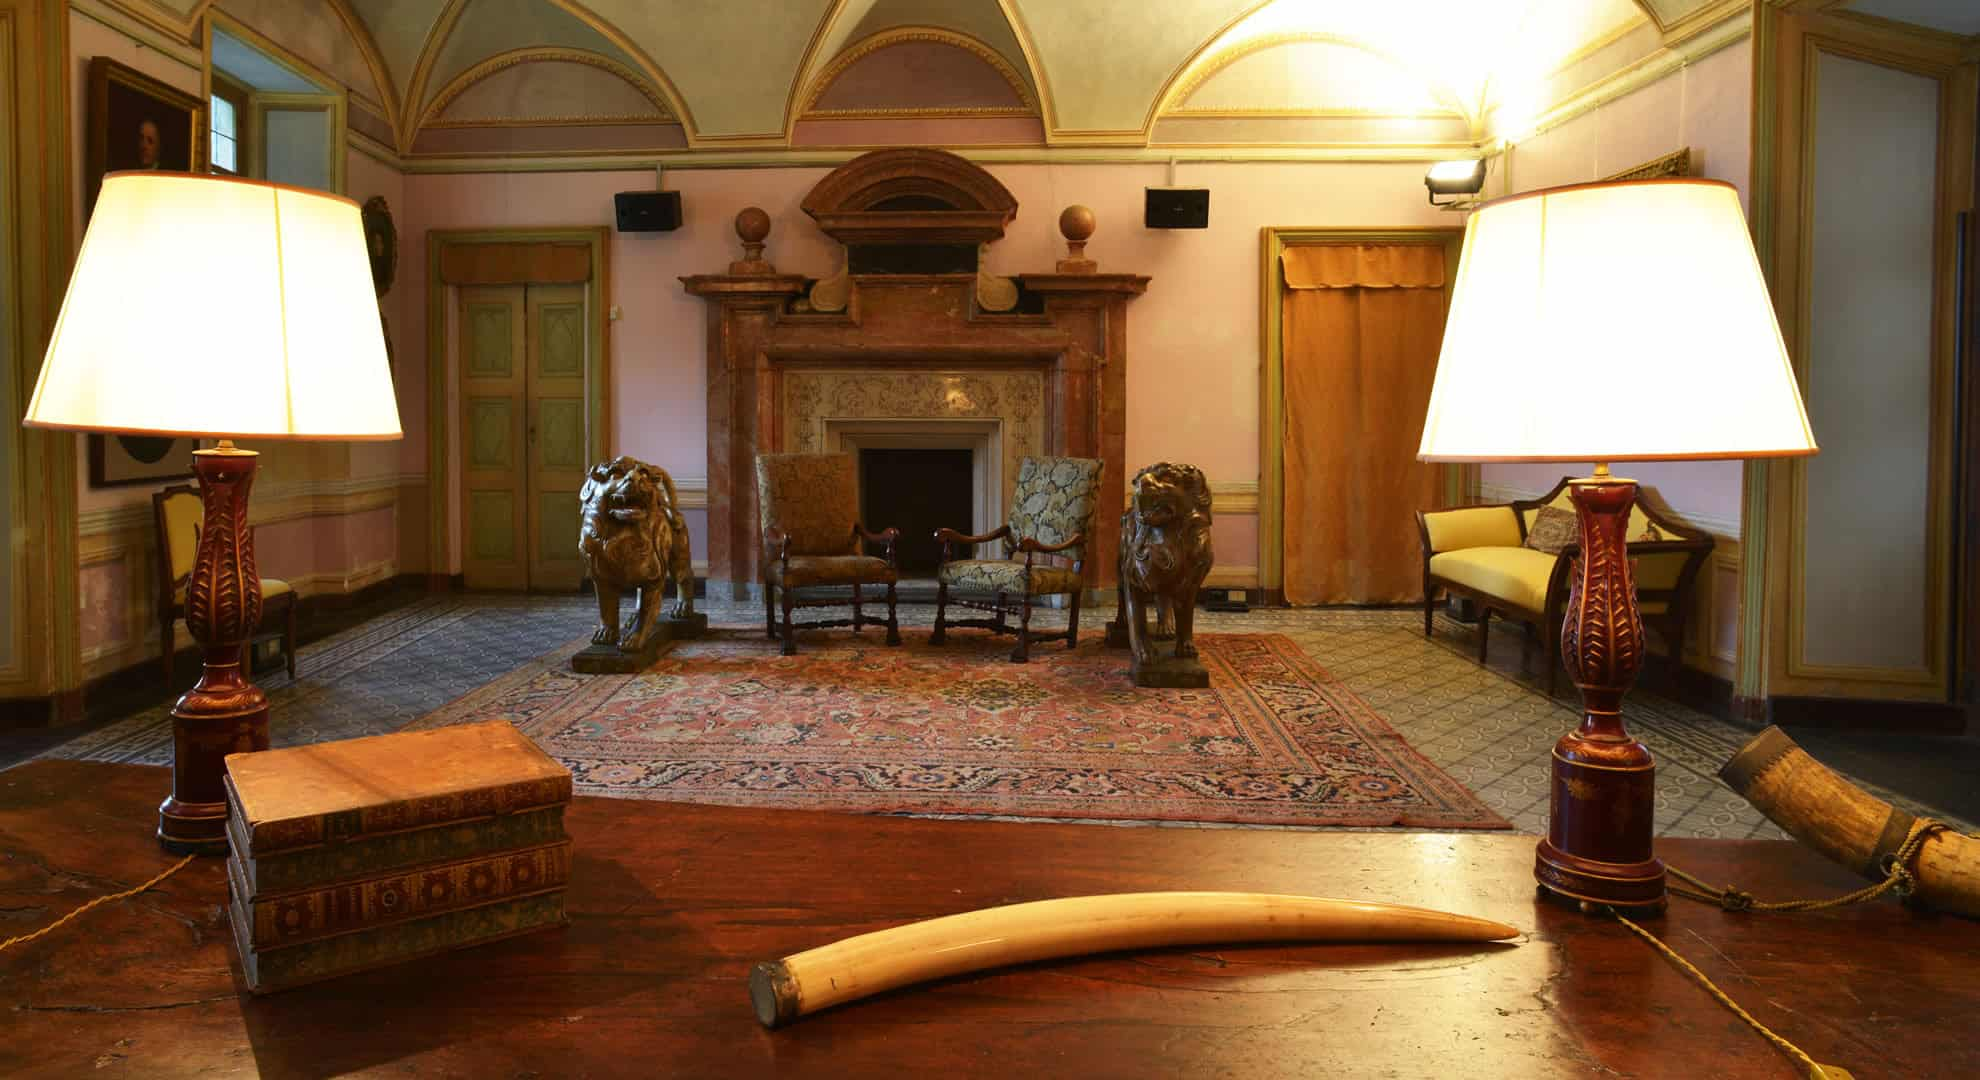 sala camino palazzo la marmora